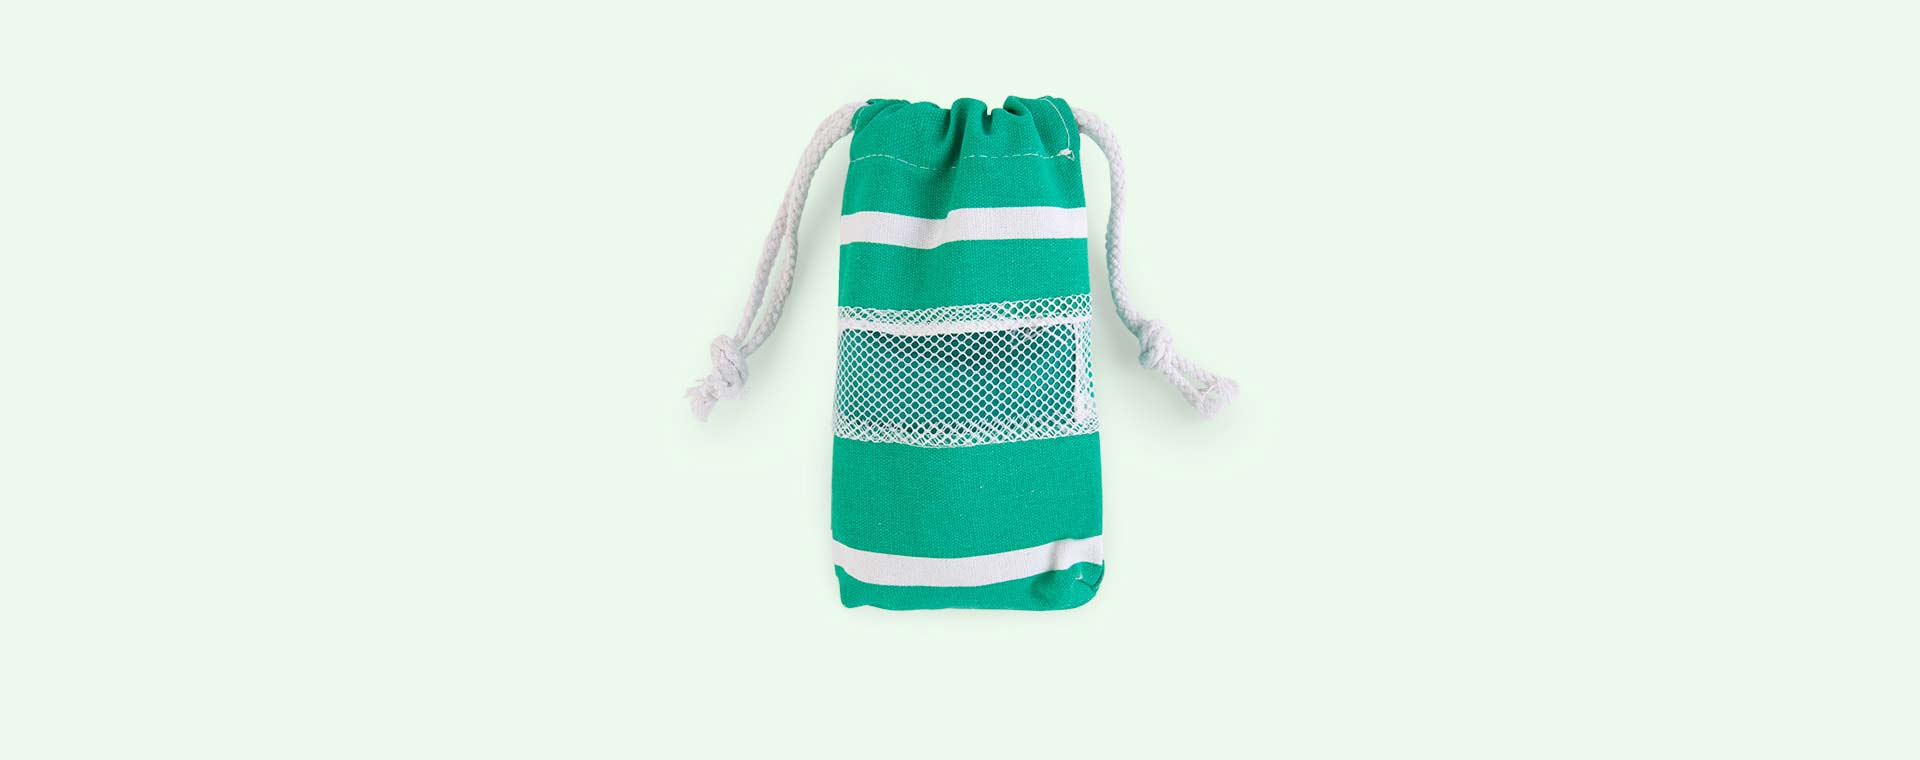 Green Dock & Bay Towel